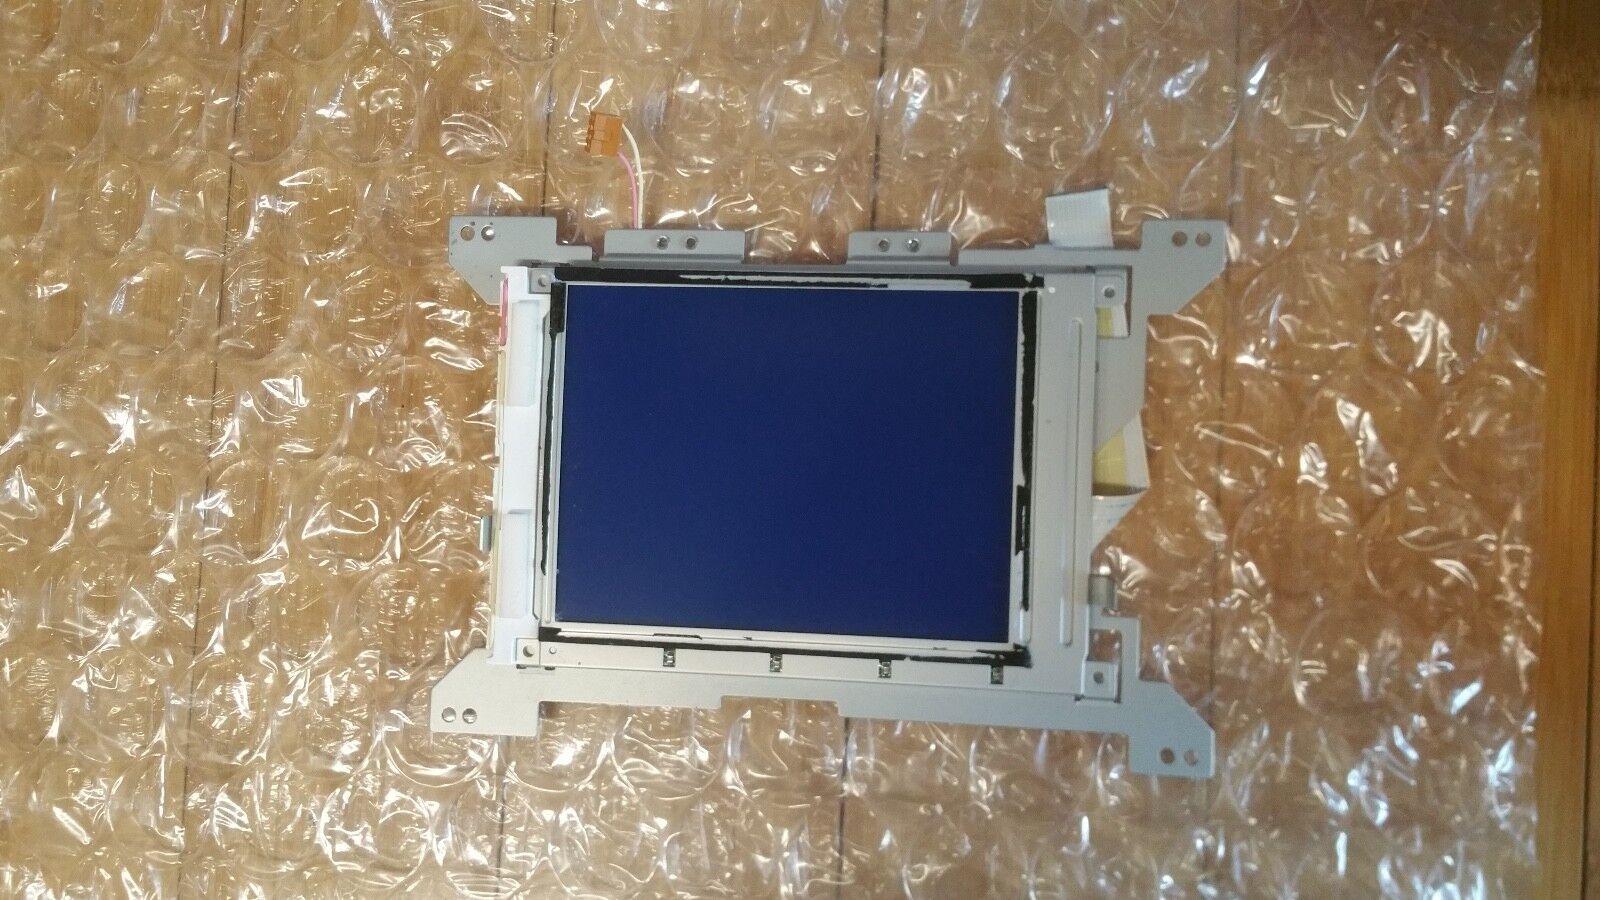 Korg Triton Extreme 61, 76, 88 - KORG FACTORY LCD SCREEN PANEL UNIT w screws